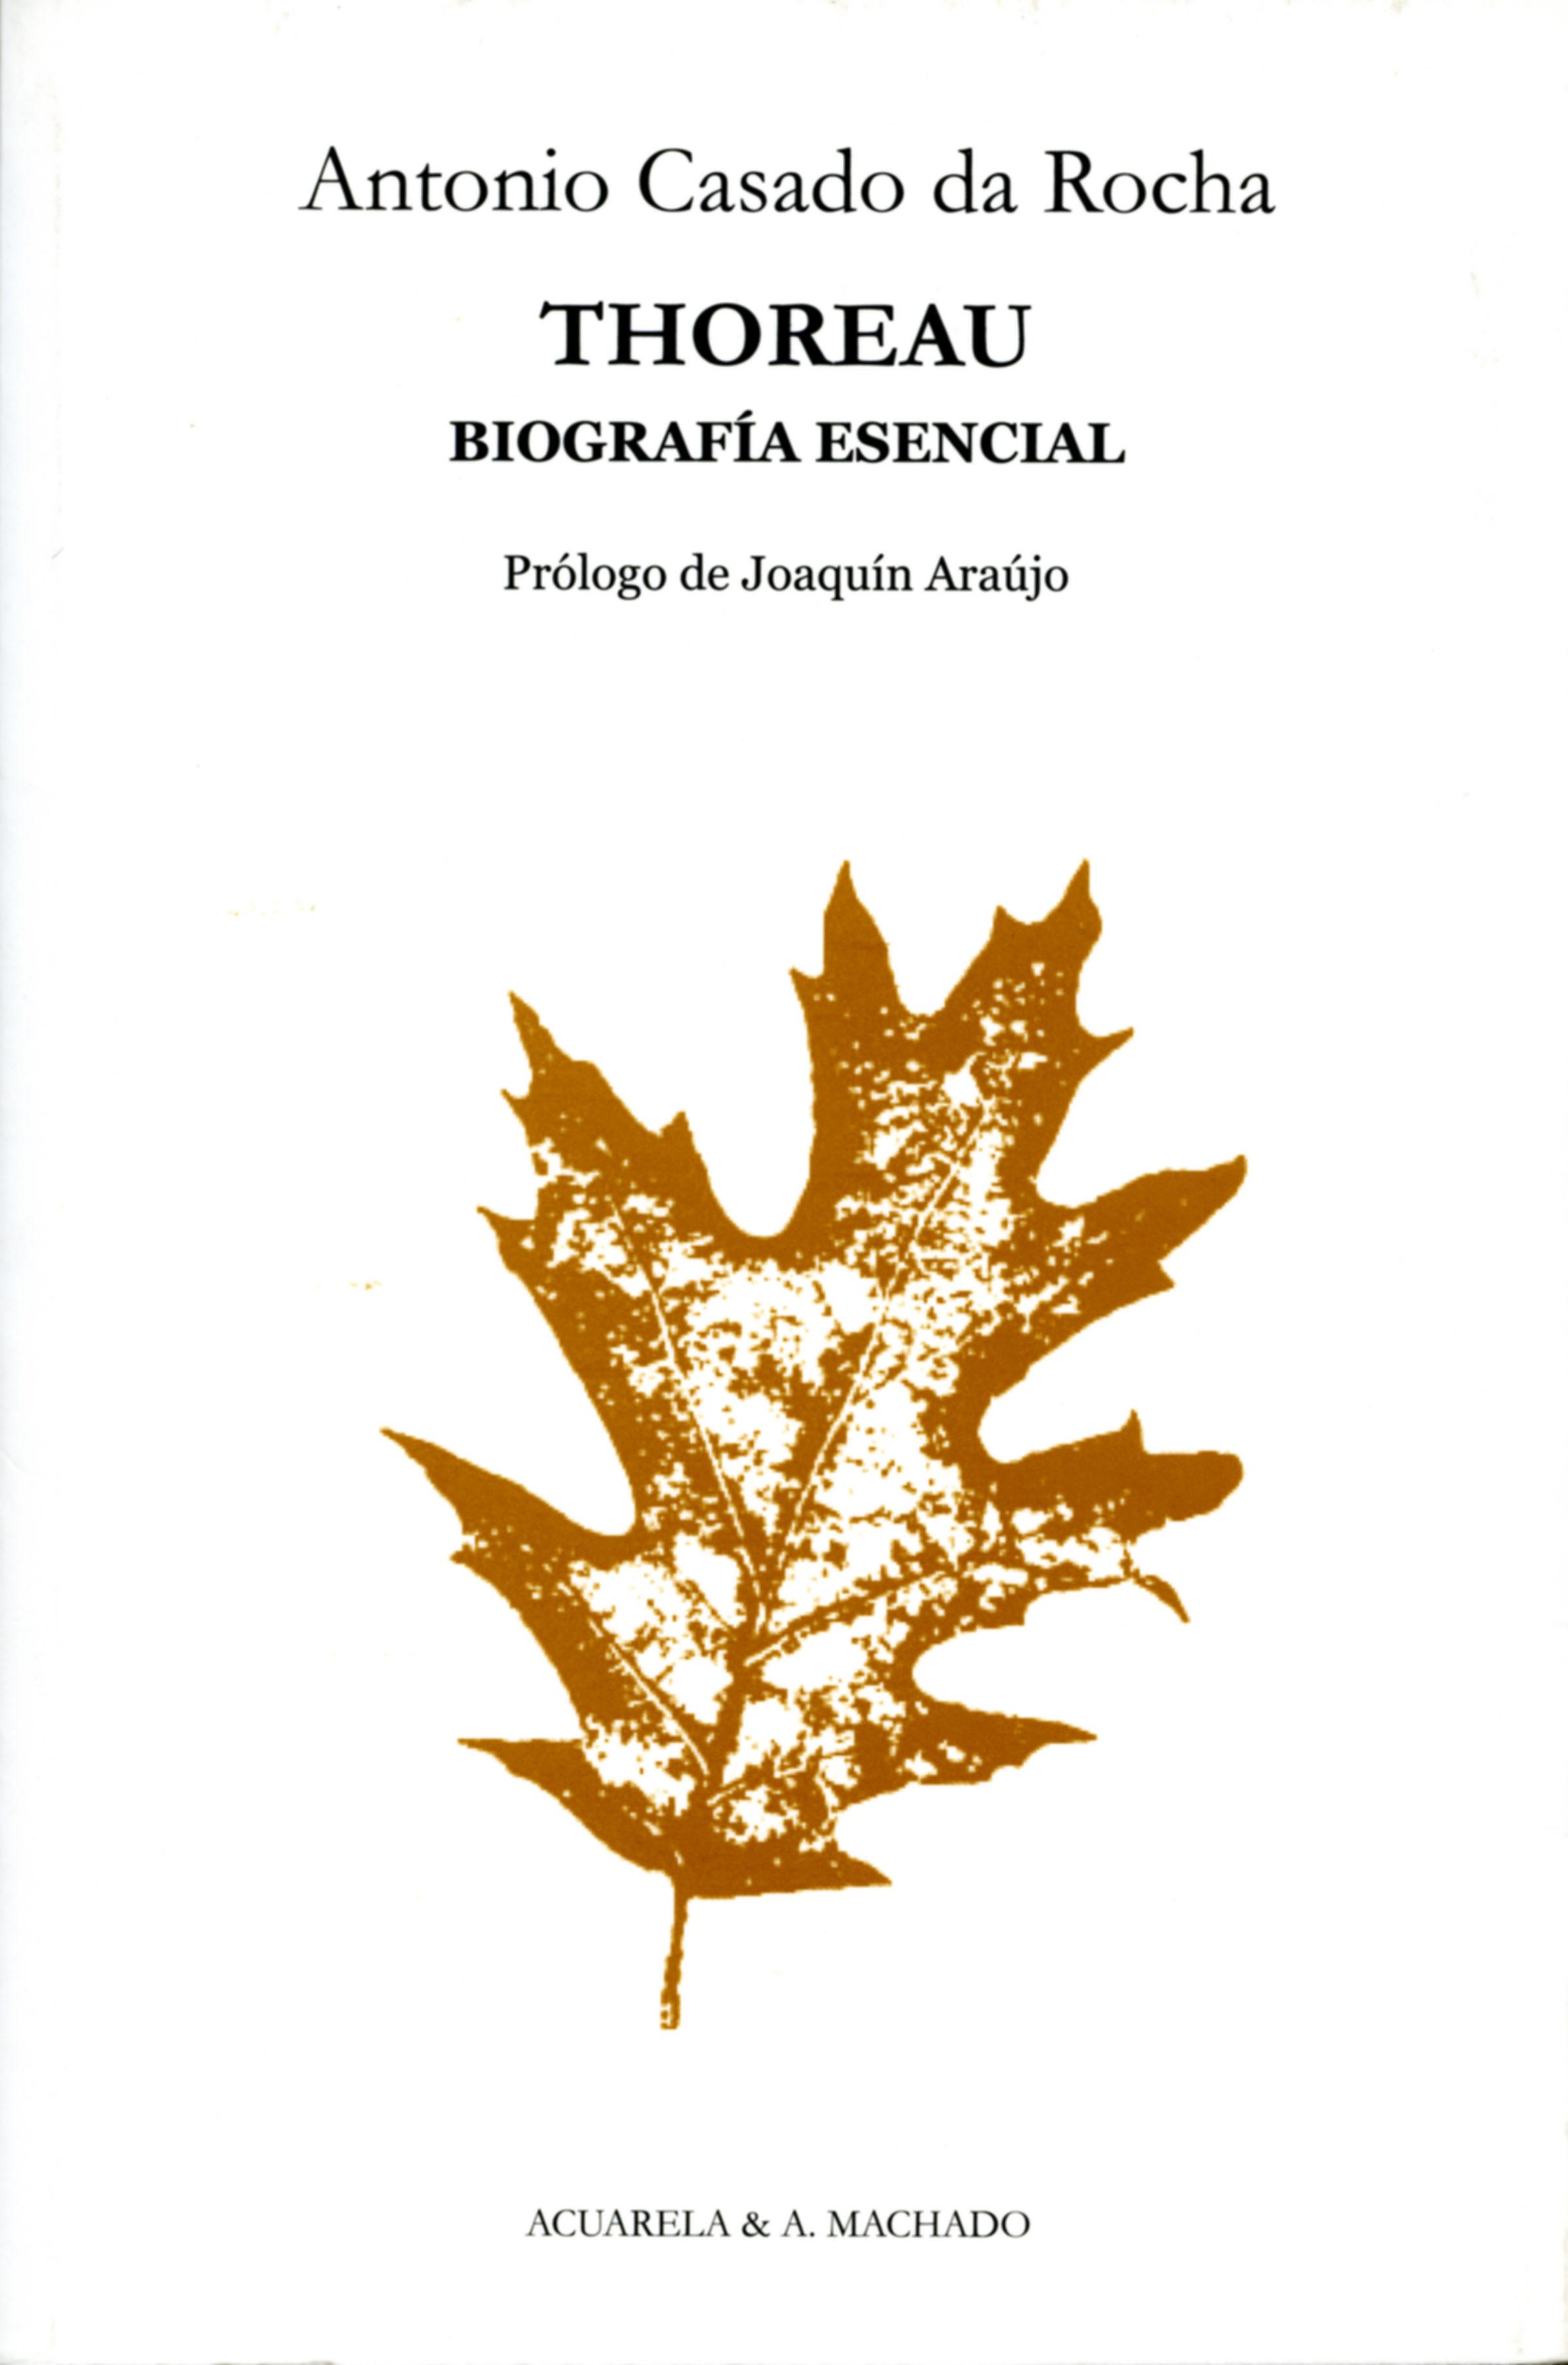 Thoreau: Biografía esencial (Acuarela & A. Machado nº 40)